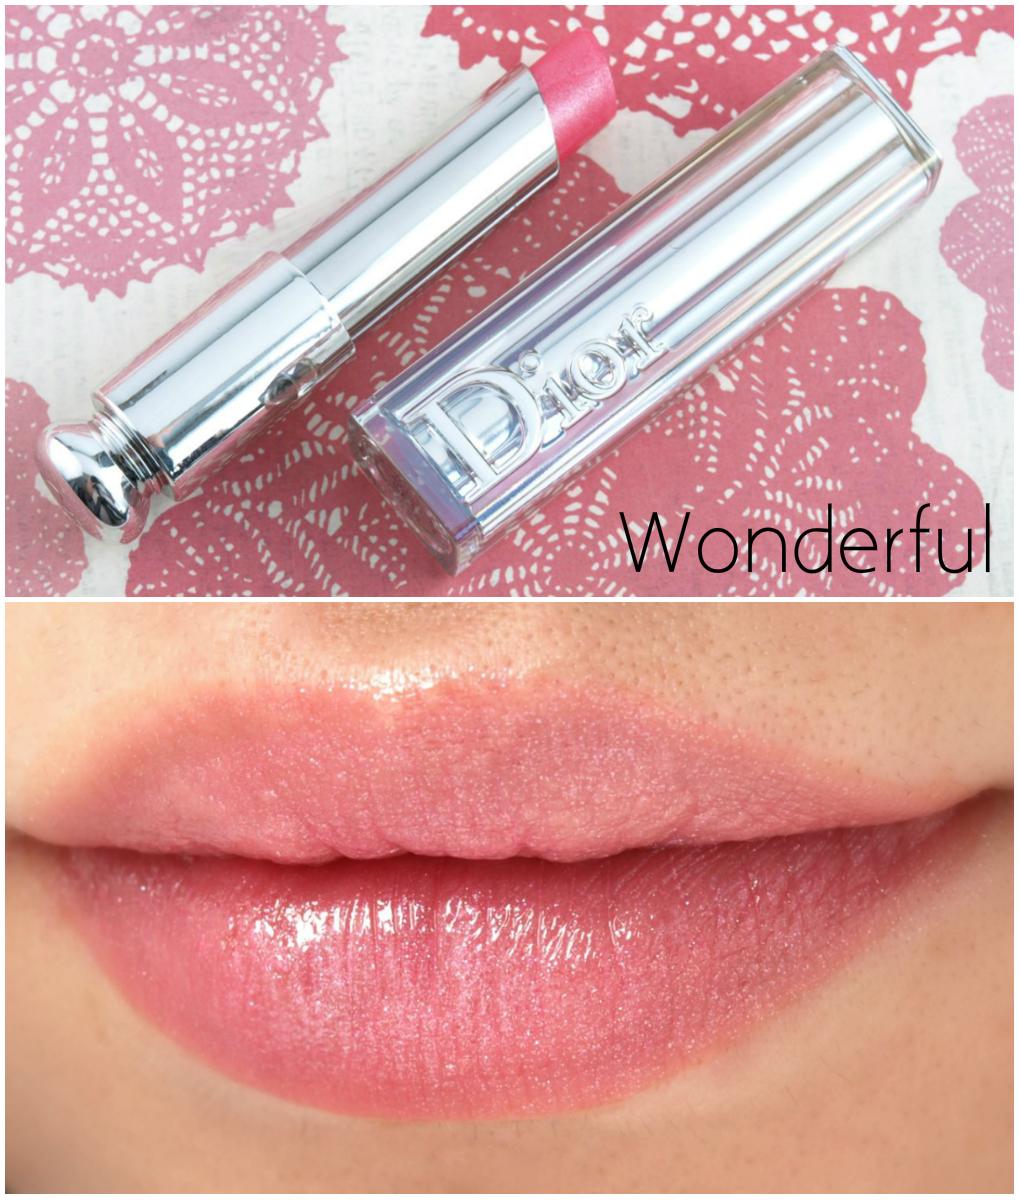 NEW Dior Addict Lipstick Collection 2015 in